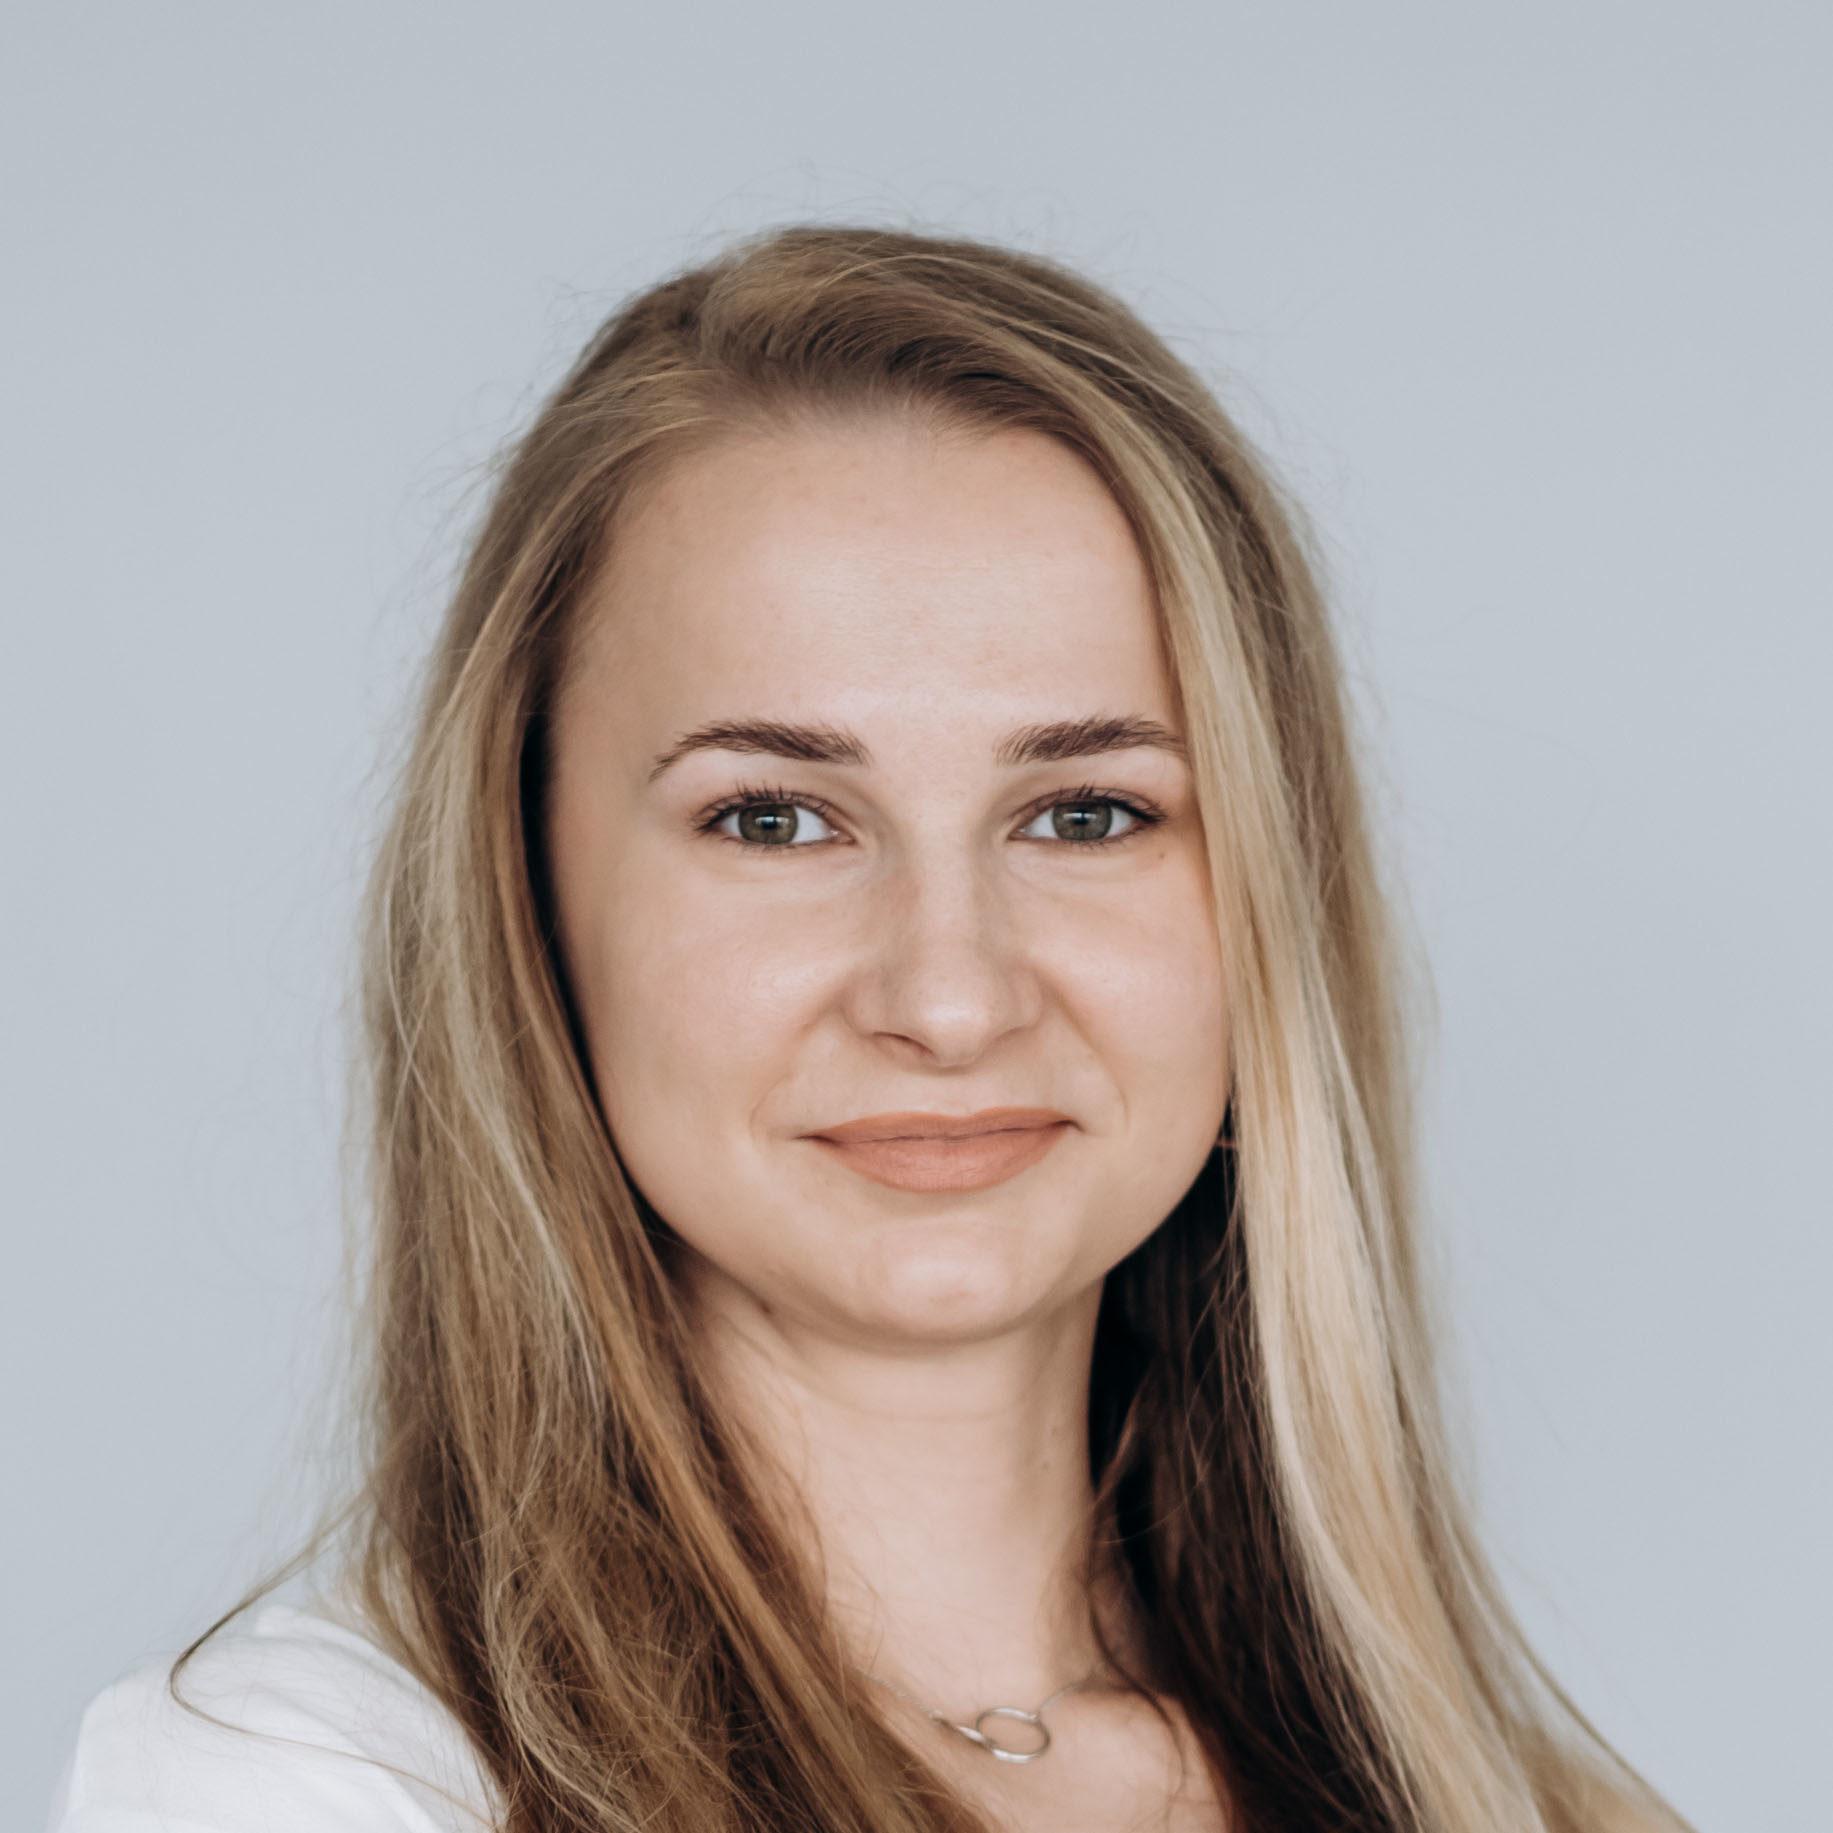 Natalia Vershynina